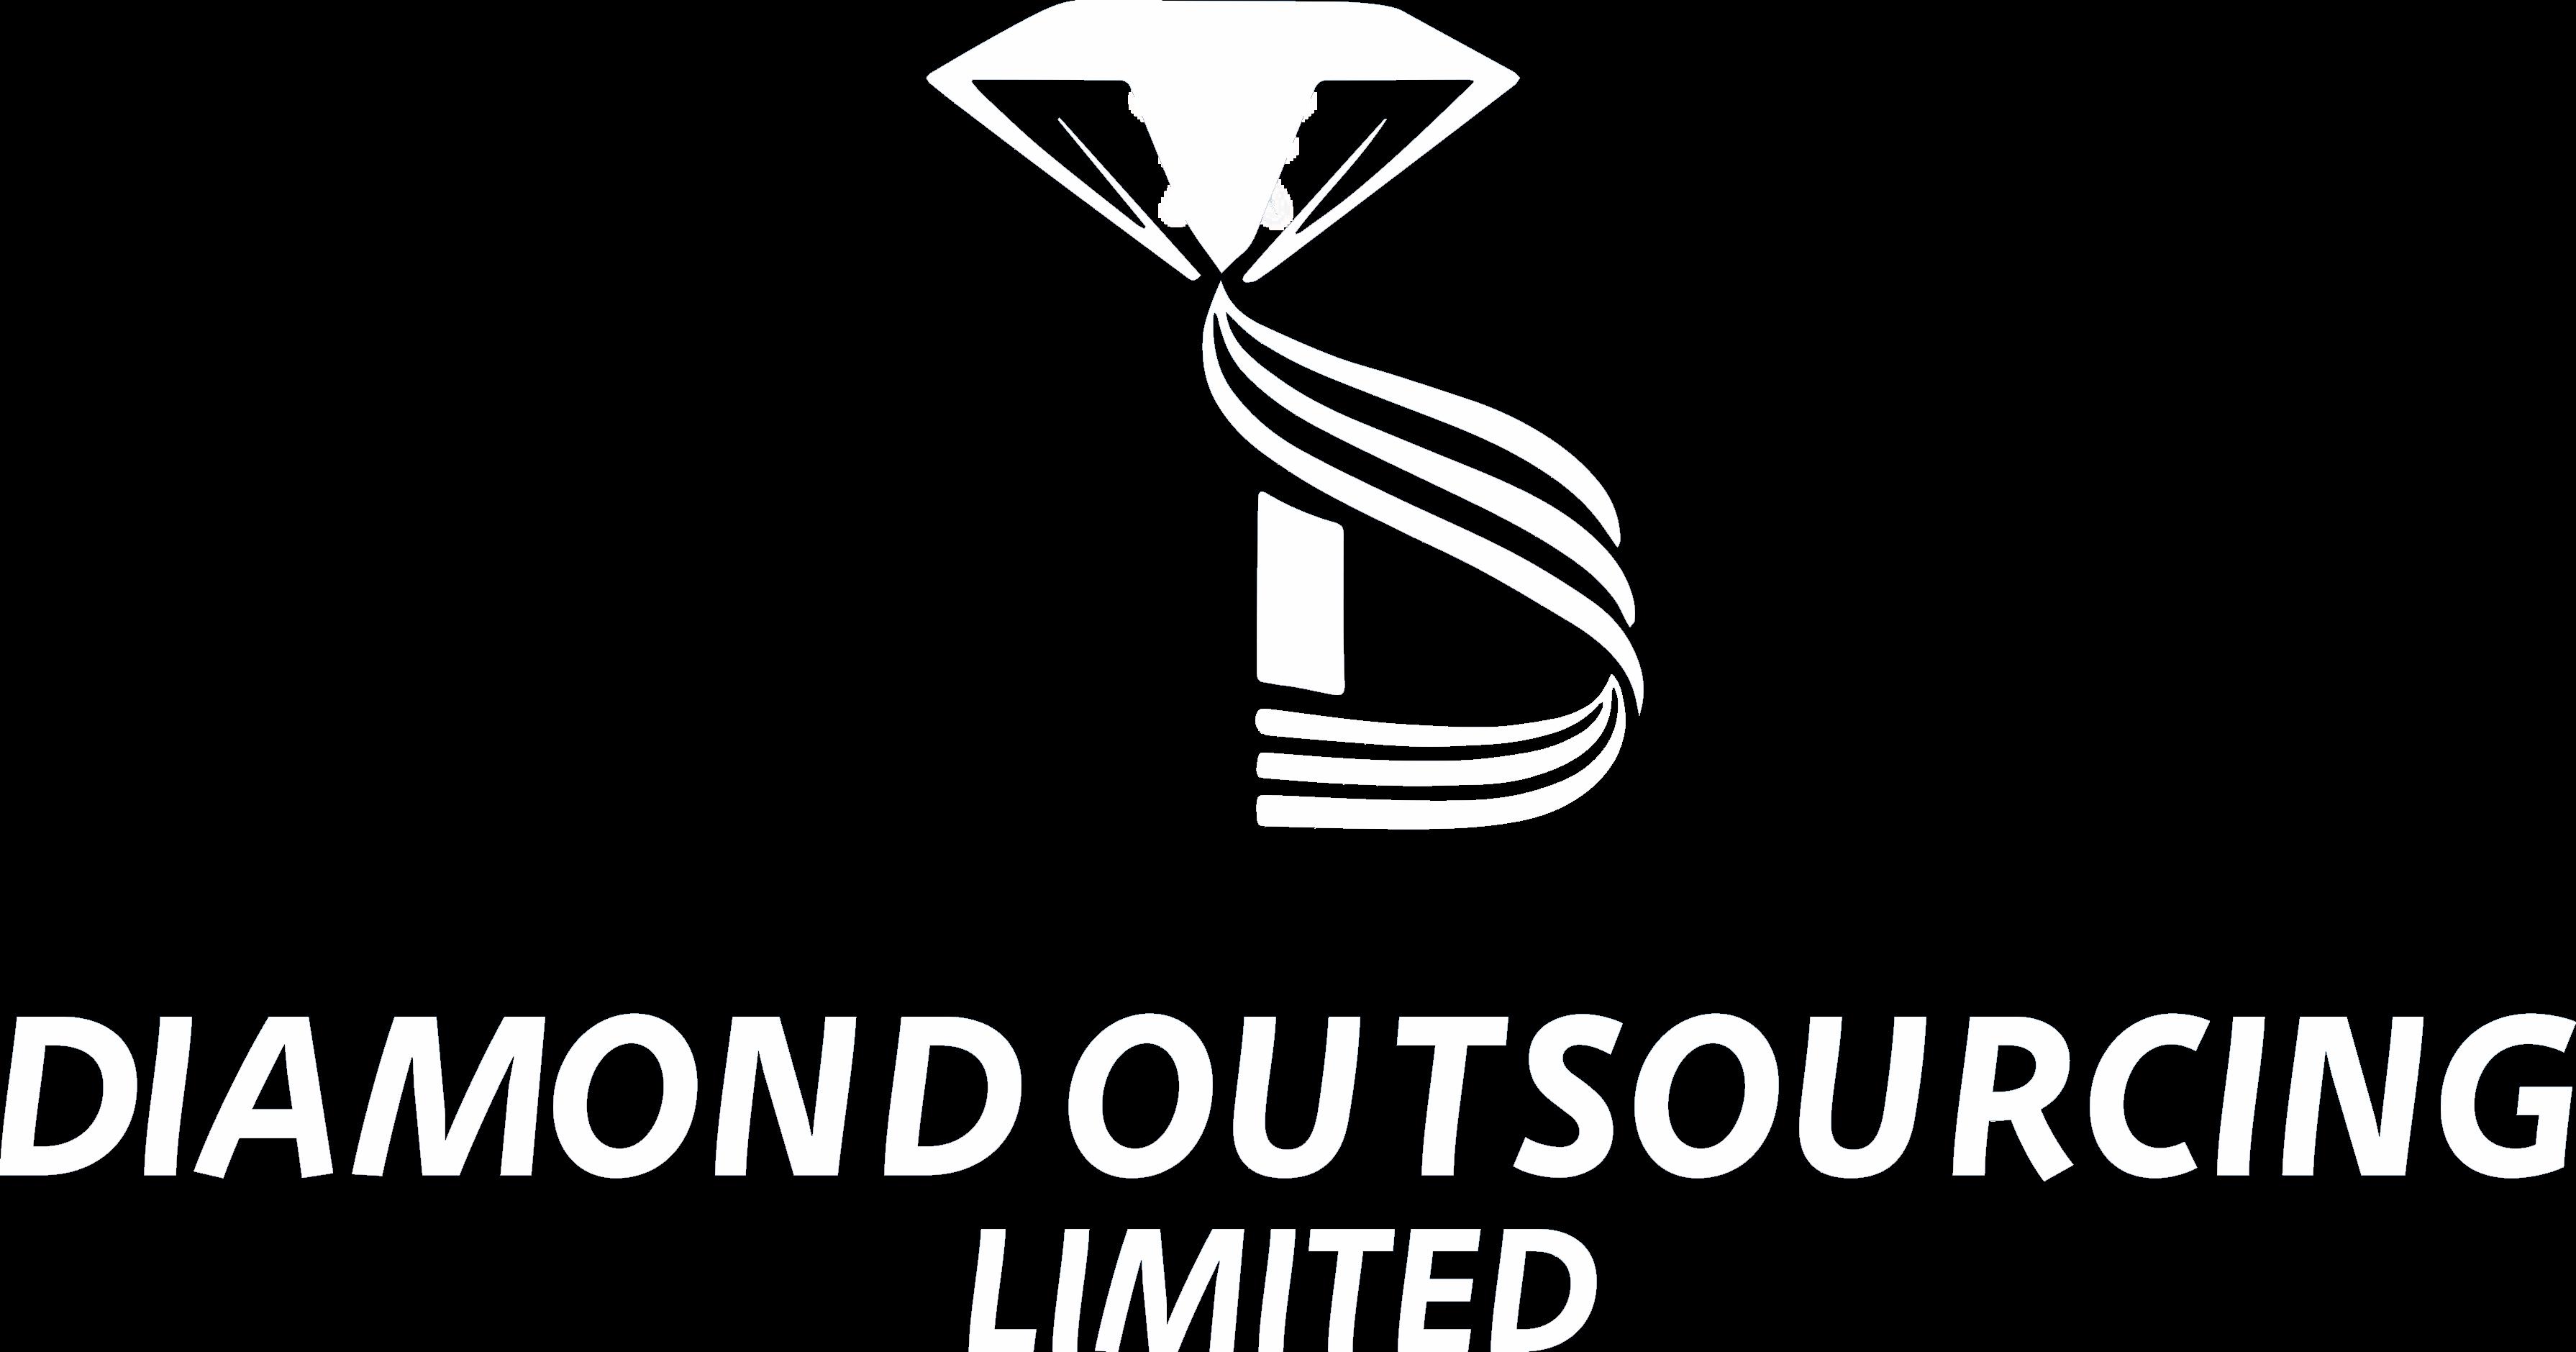 Diamond Outsourcing